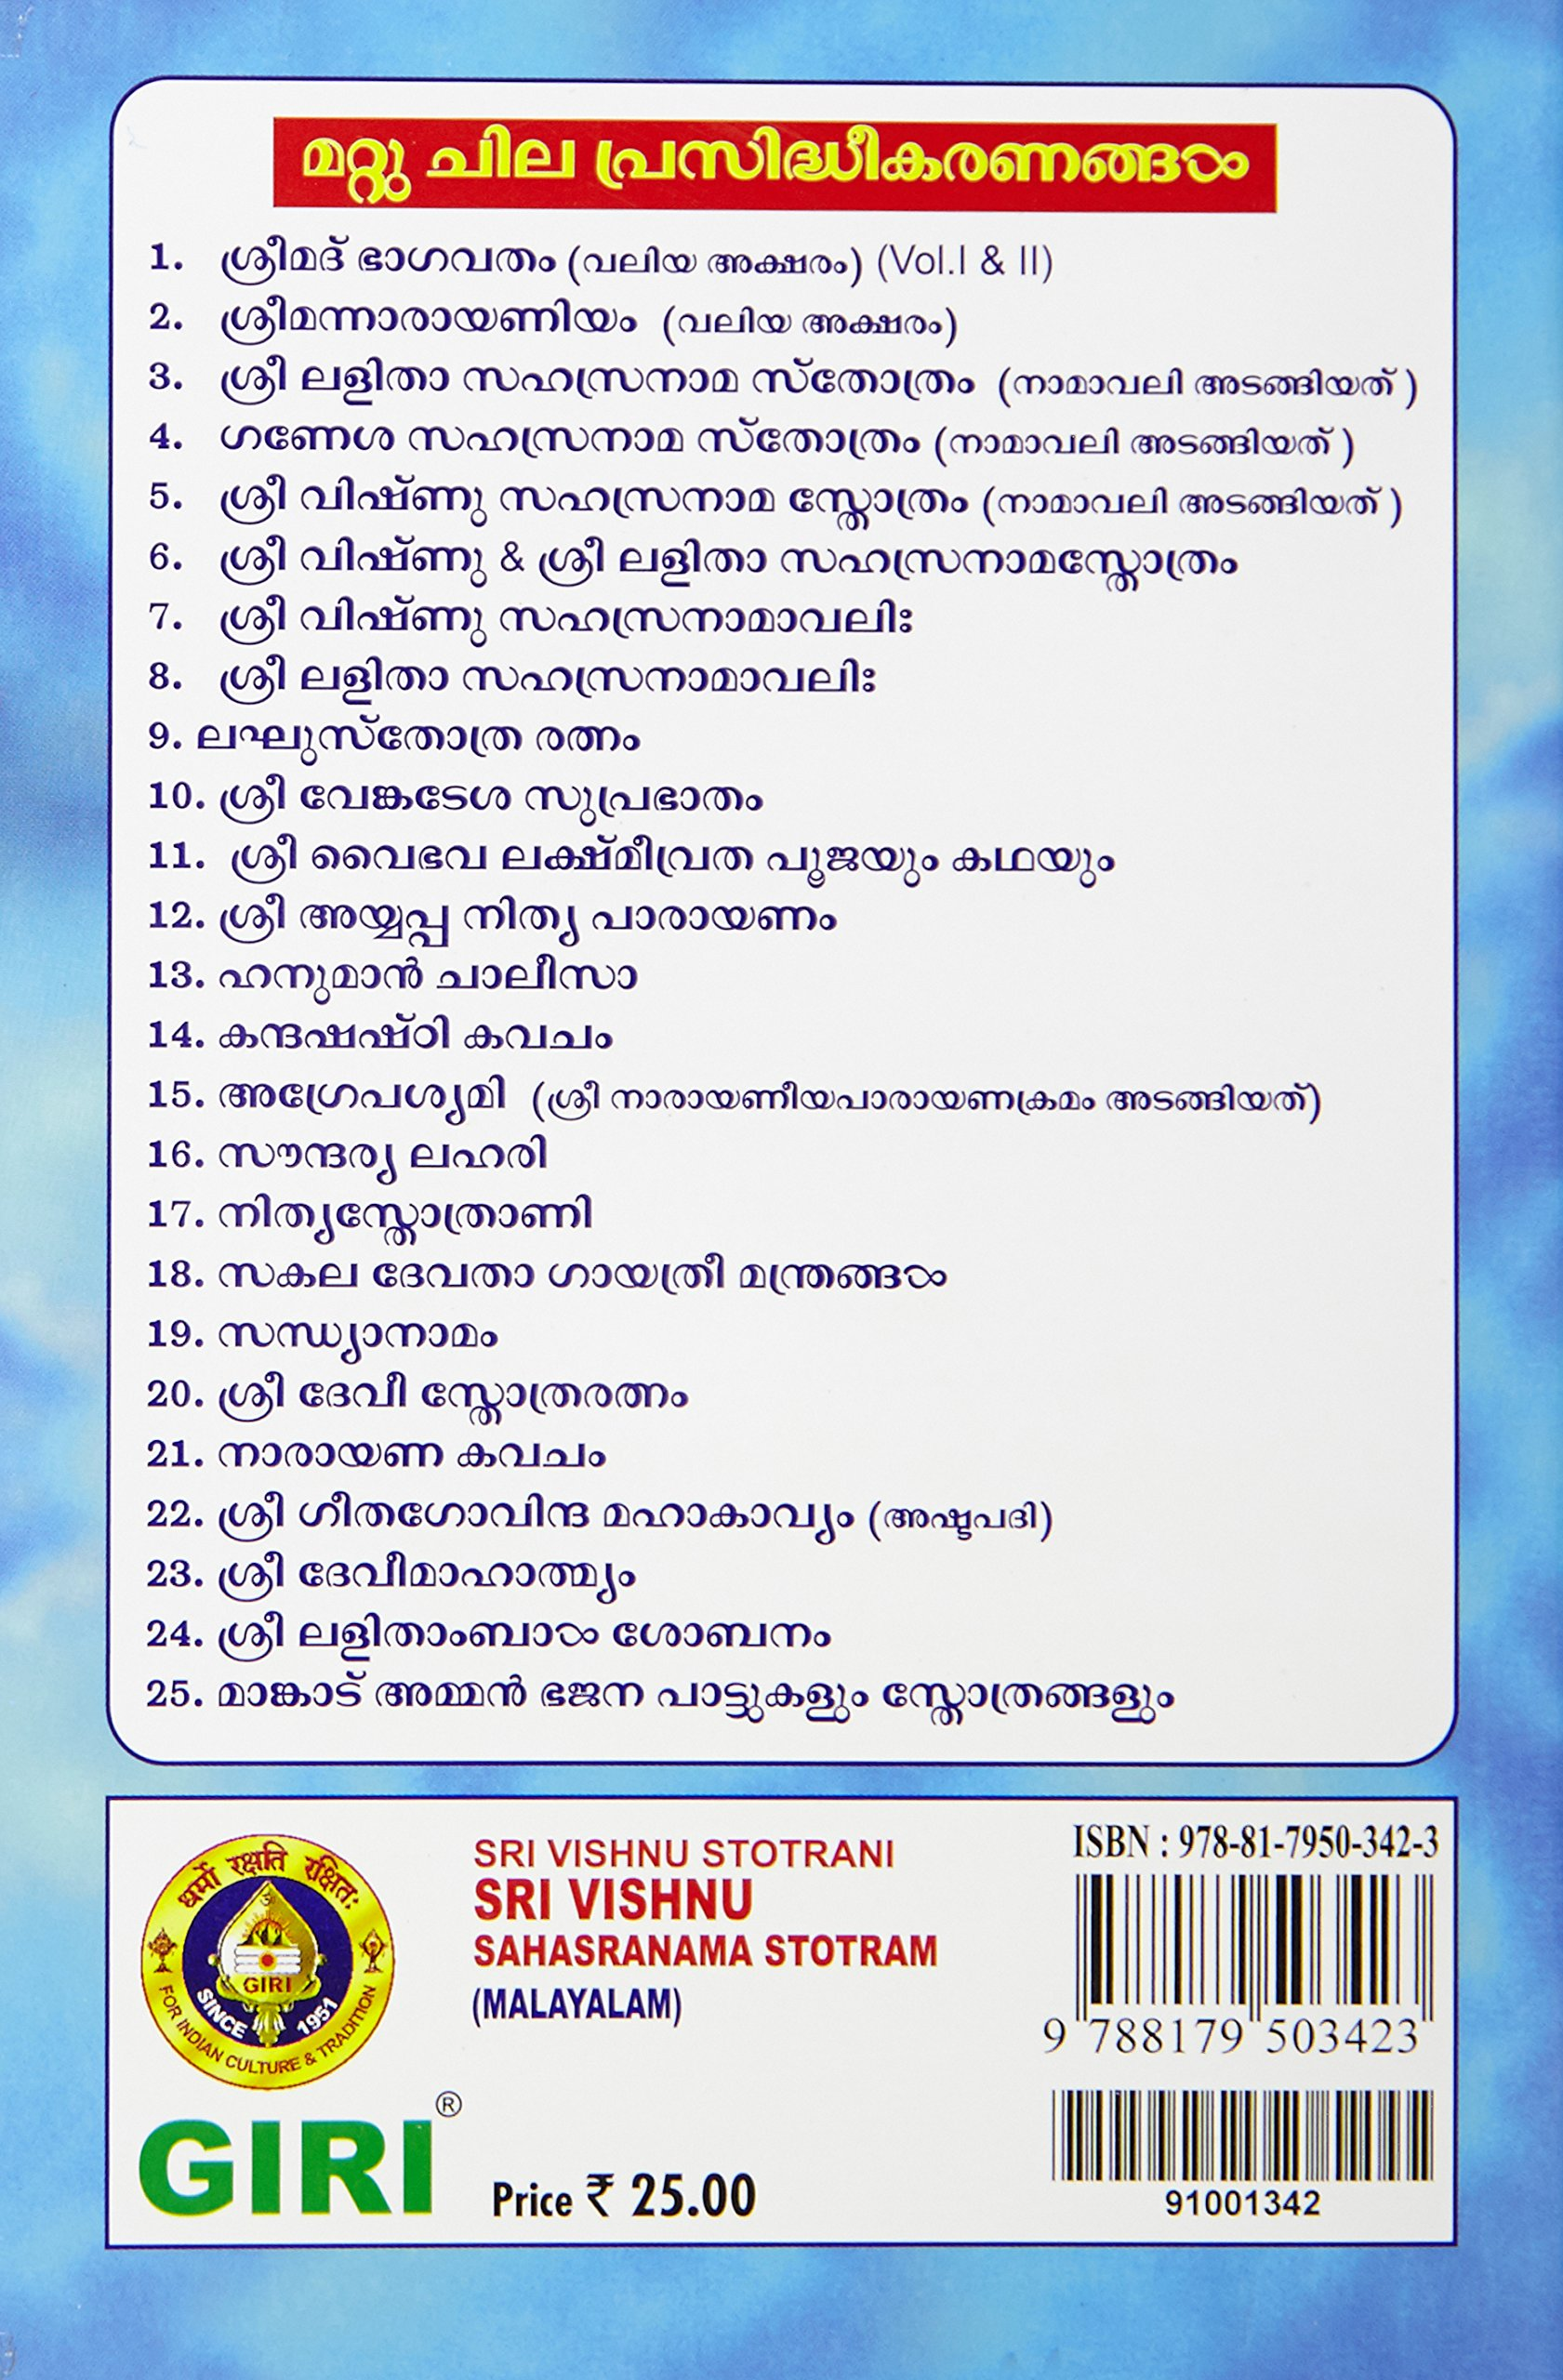 Buy Sri Vishnu Sahasranama Stotram (Malayalam) Book Online